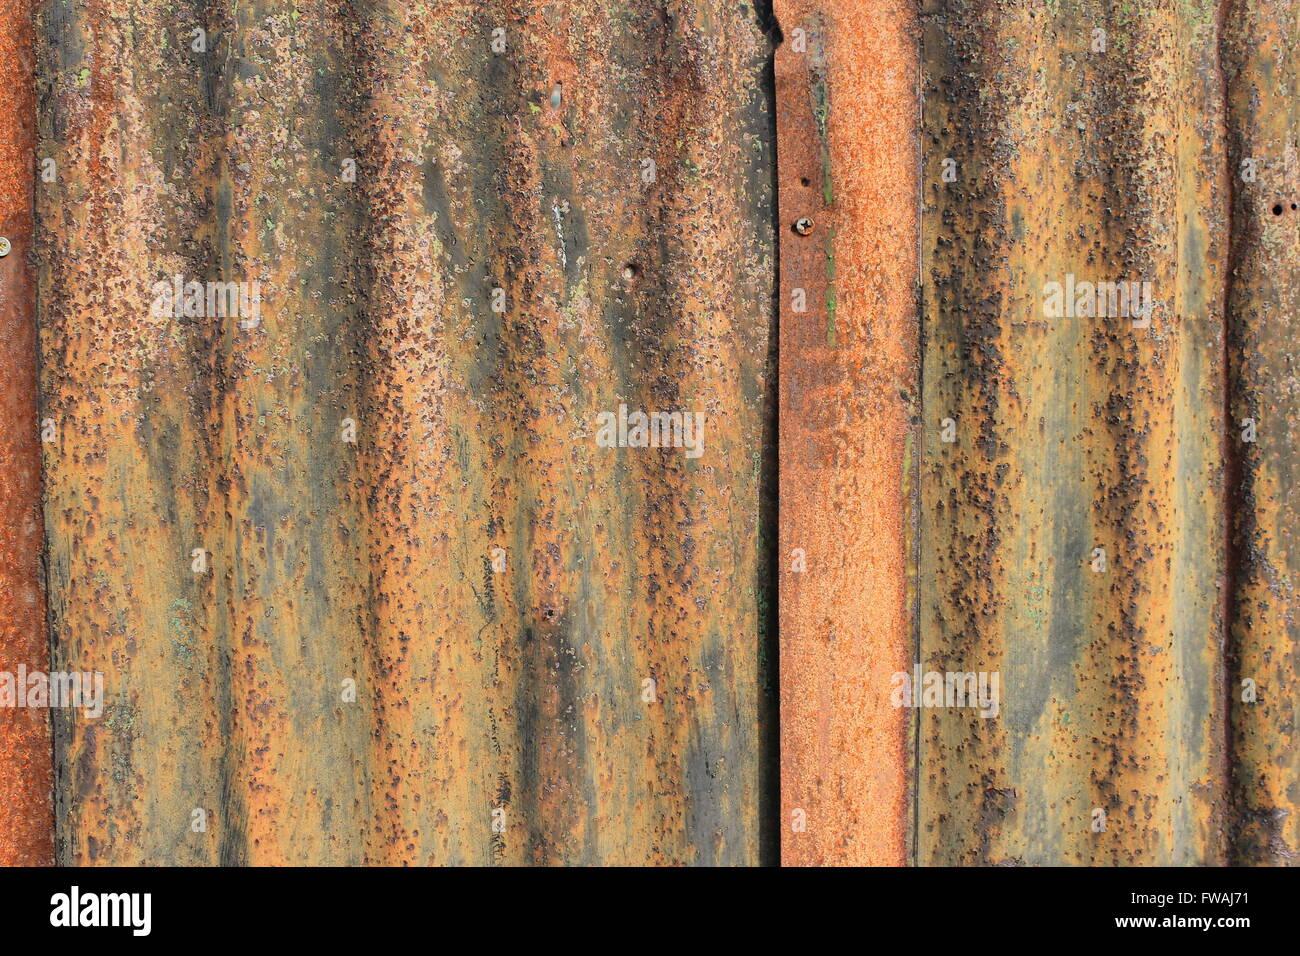 Rusty corrugated sheet metal - Stock Image